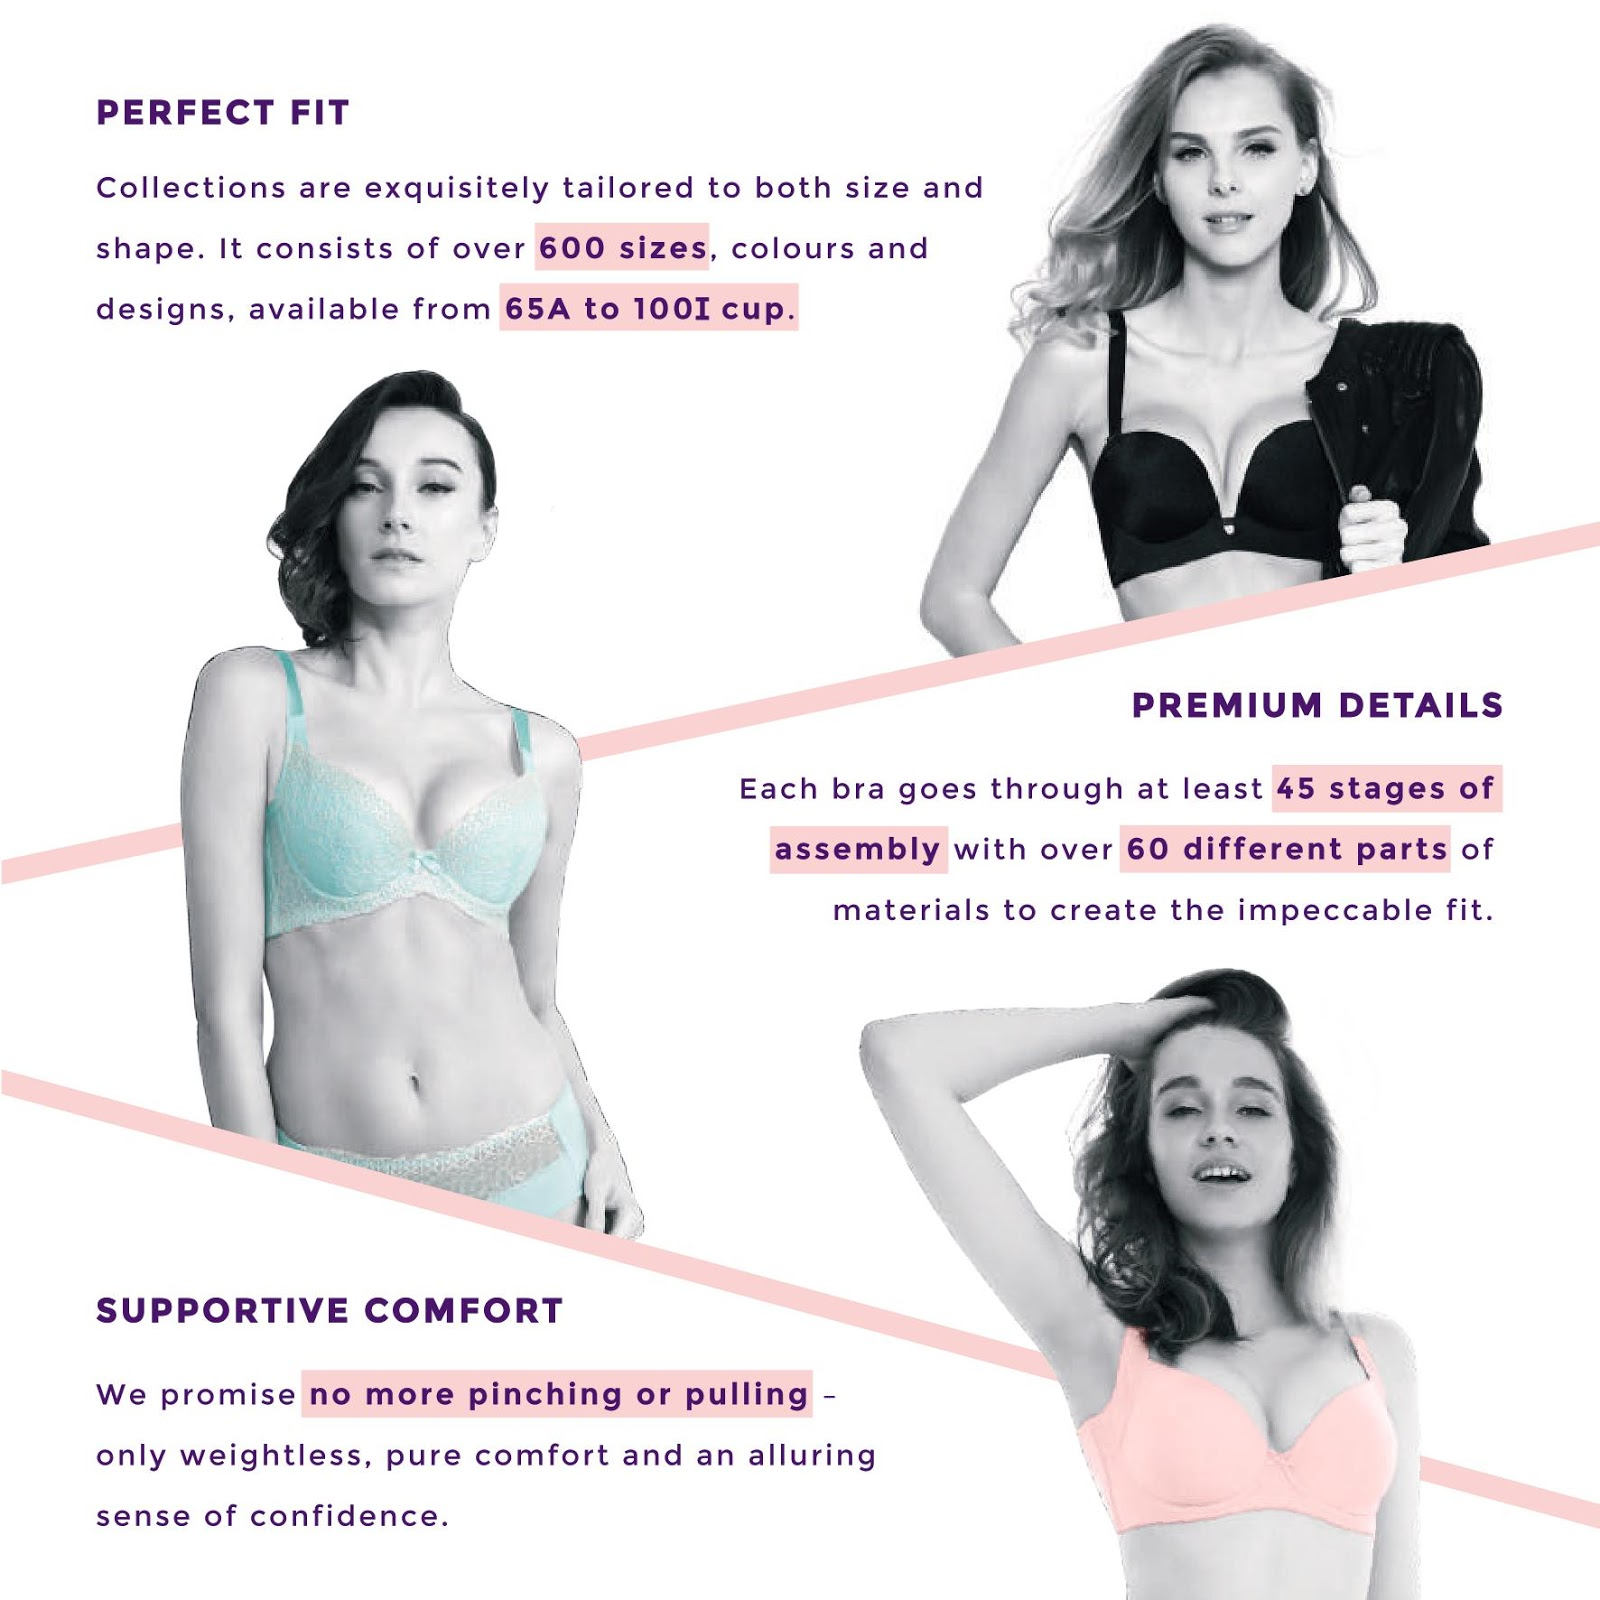 How to choose a bra